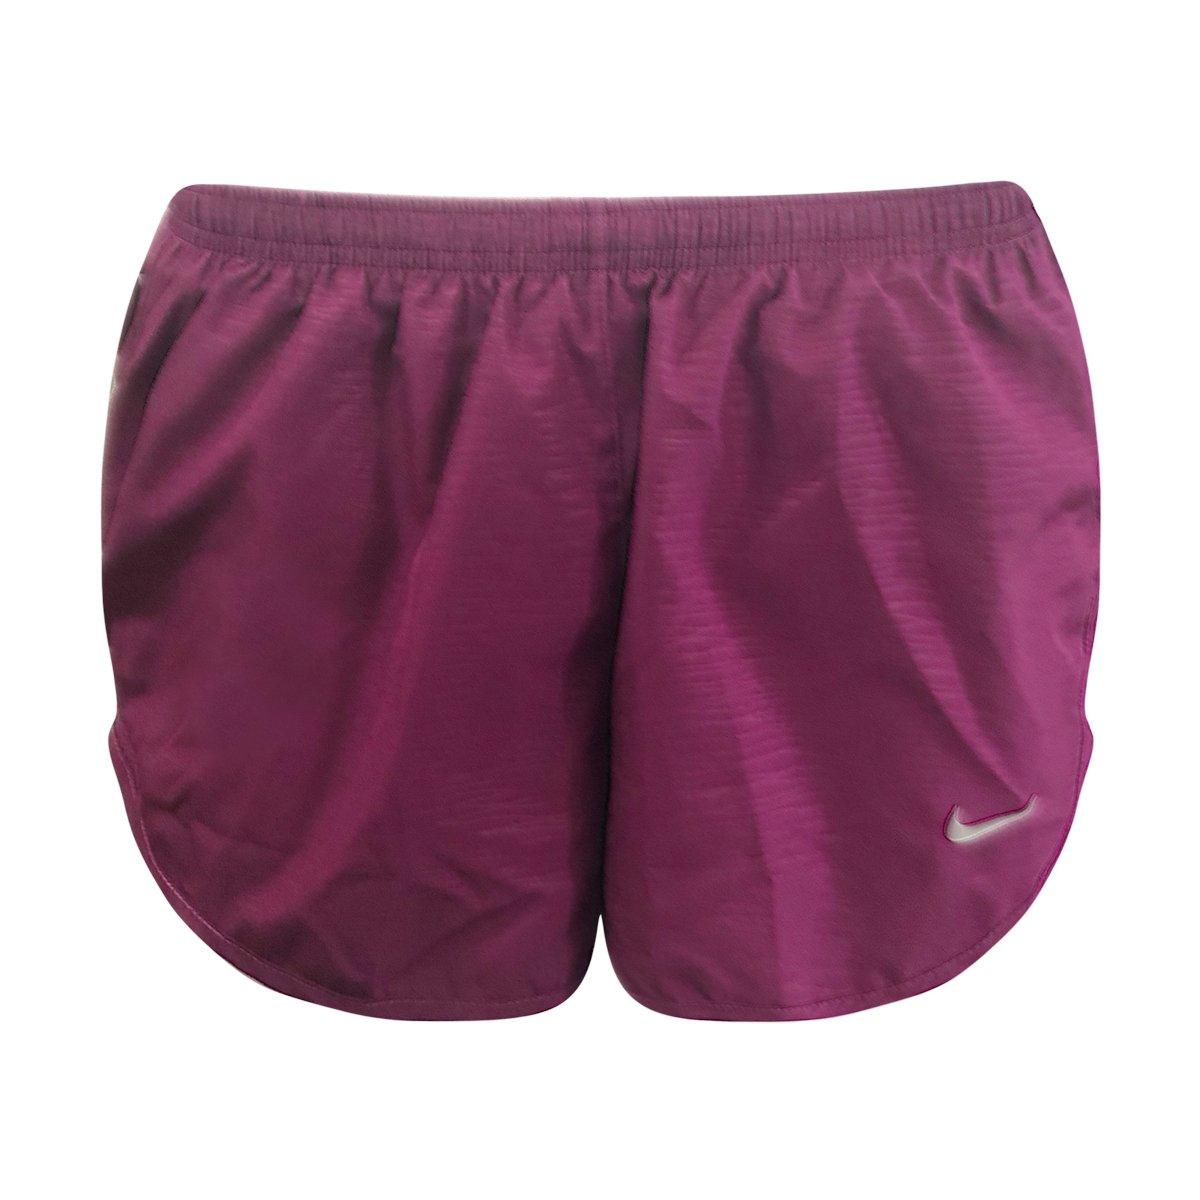 Nike Women's Modern Embossed Tempo Running Shorts True Berry 895116-665 (S) by Nike (Image #1)